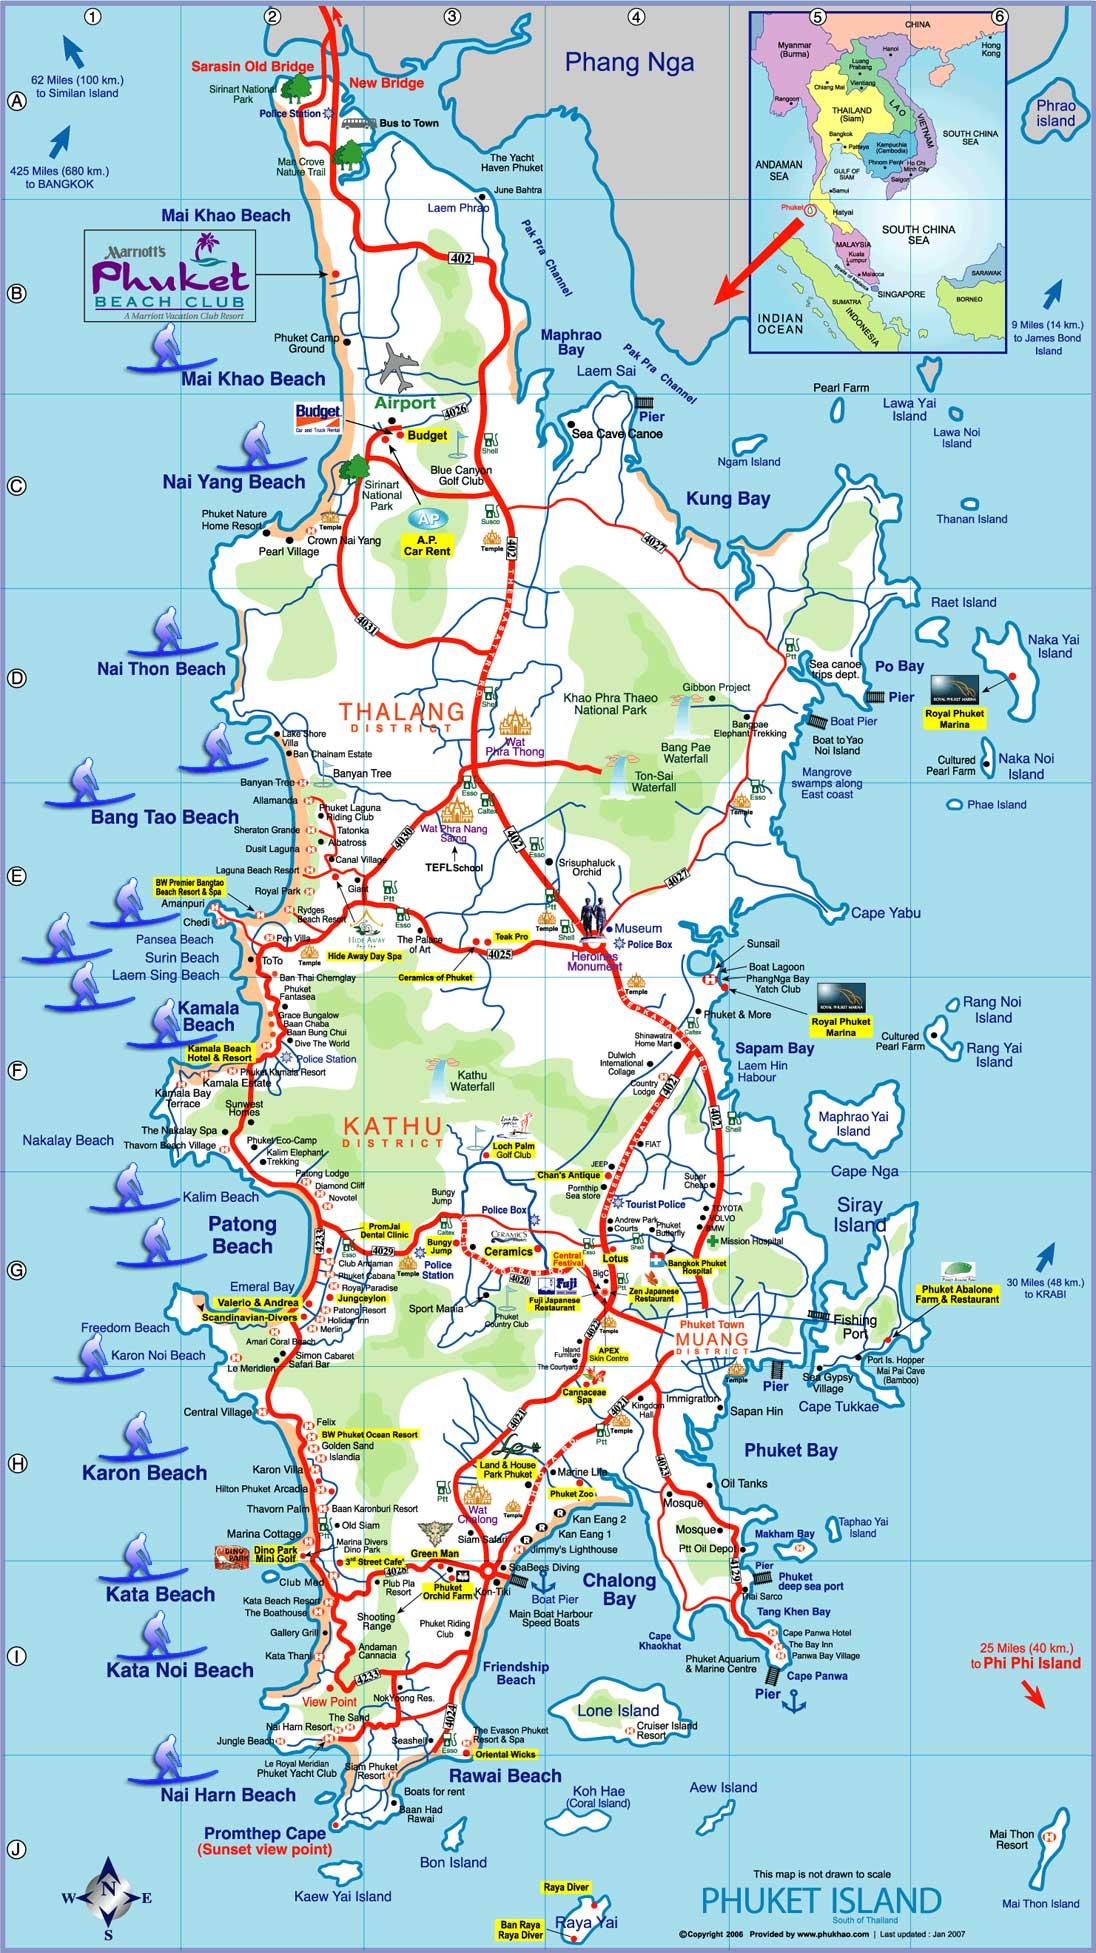 phuket-surf-spot-map